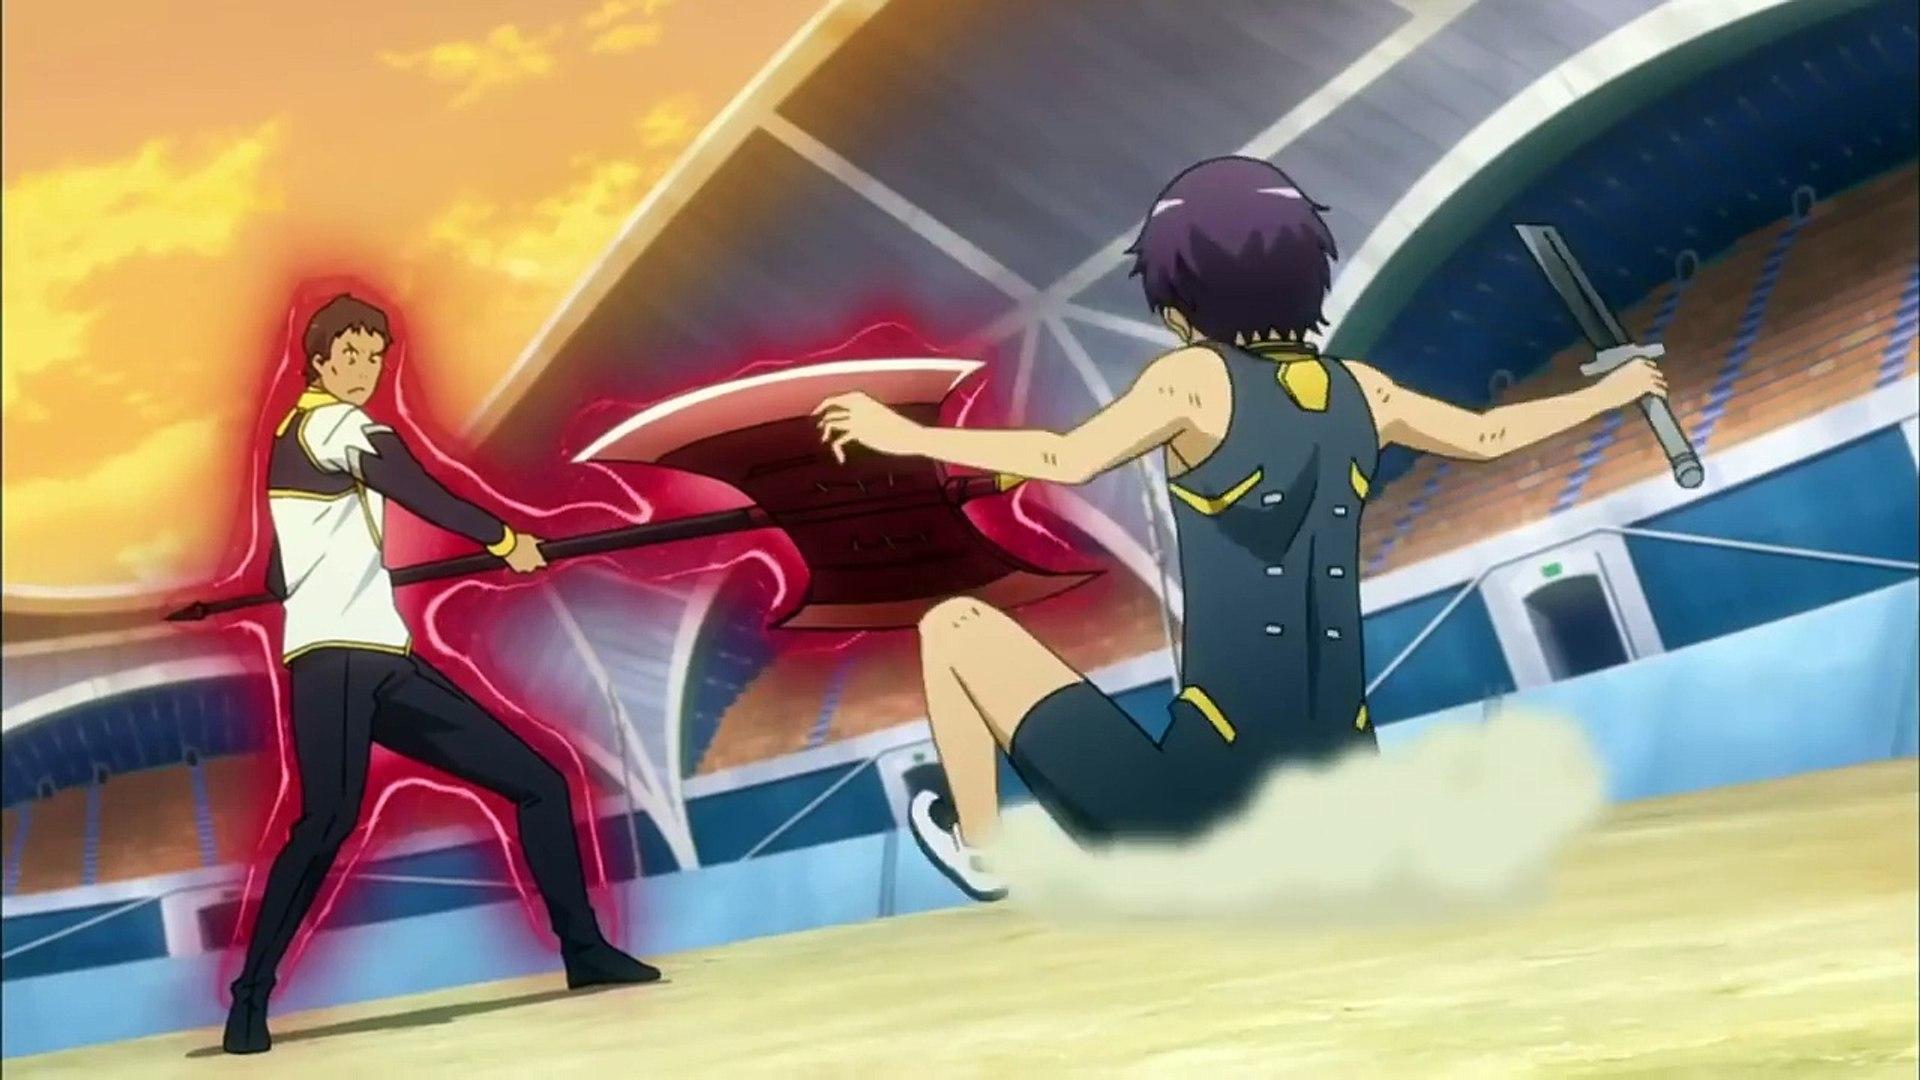 Seiken Tsukai No World Break Amv Beginning Again Video